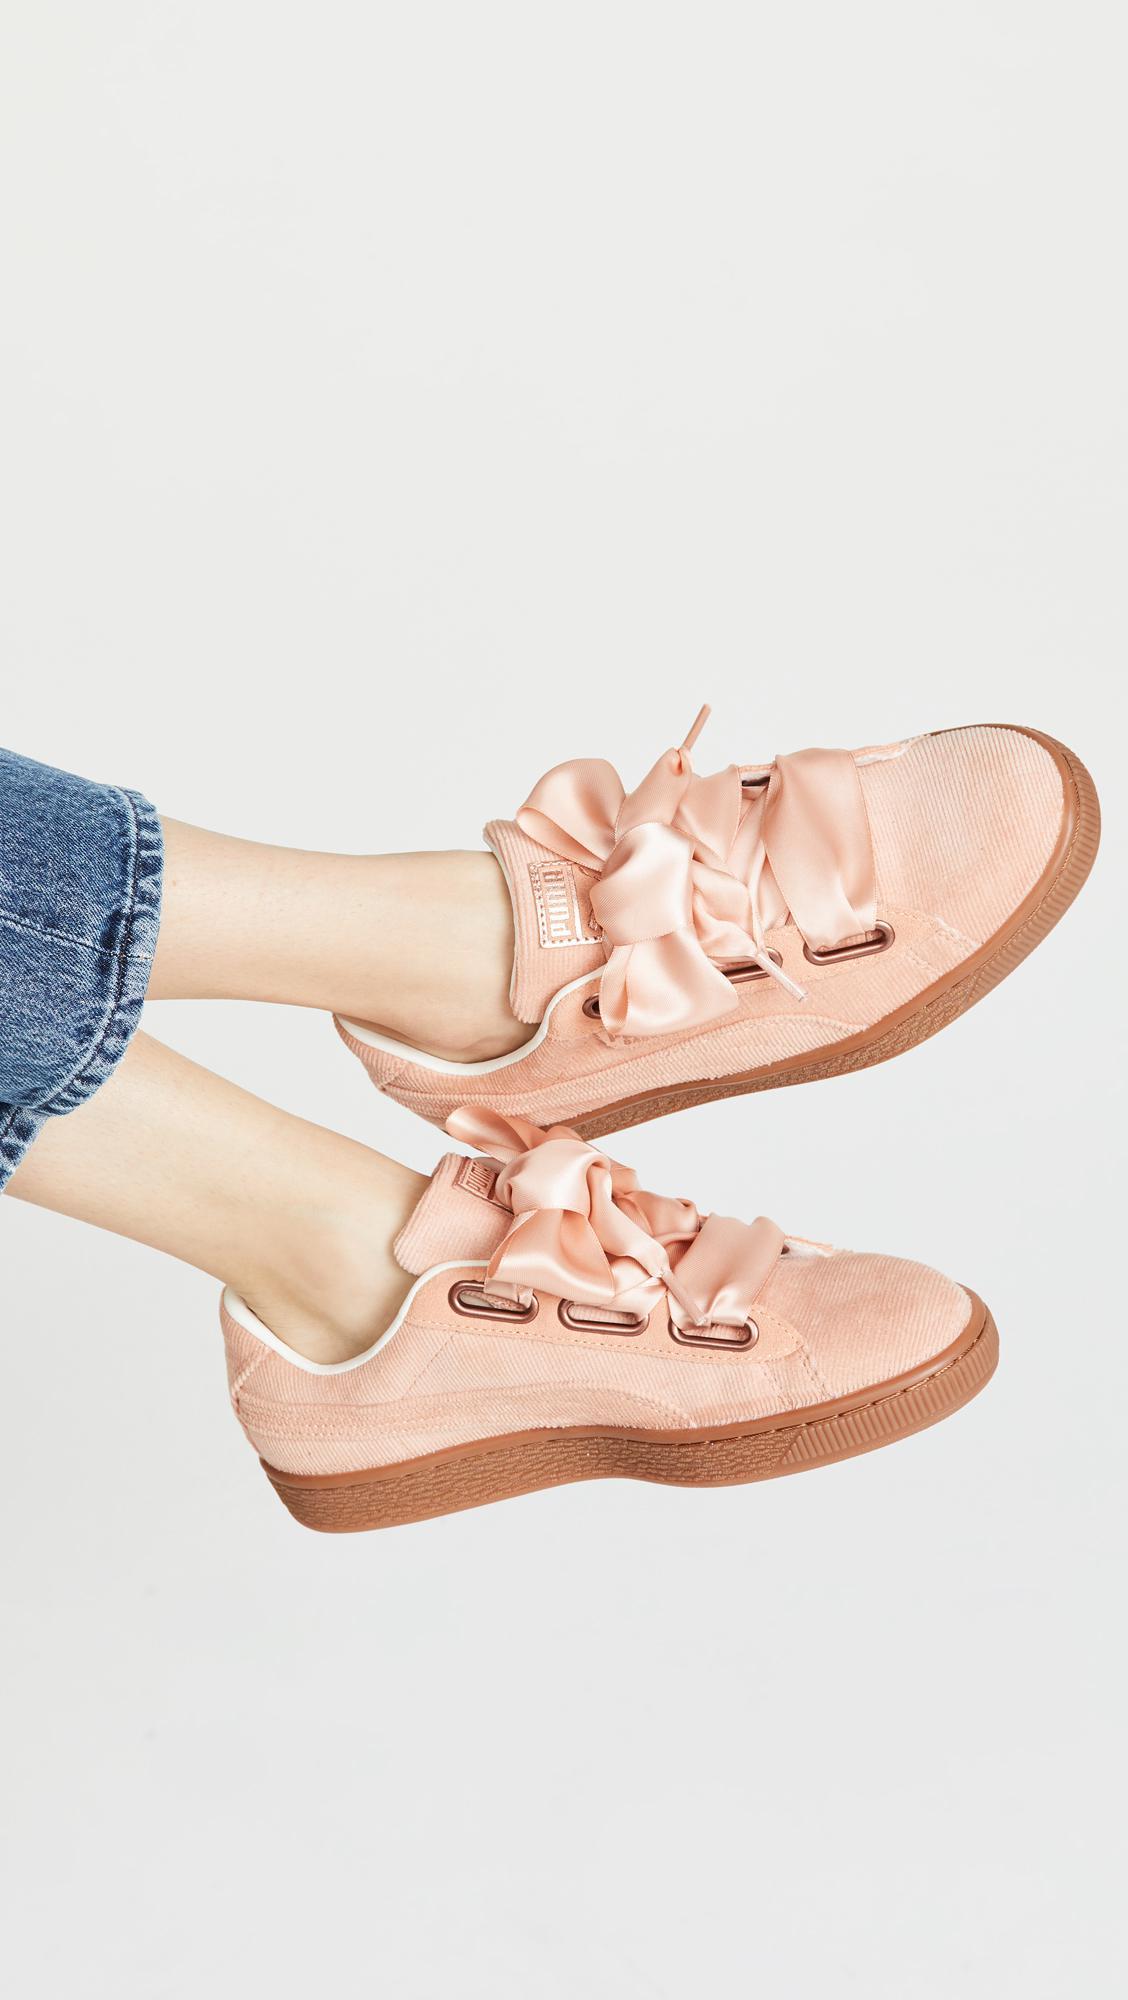 454fa7039f557 Lyst - PUMA Basket Heart Corduroy Sneakers in Pink